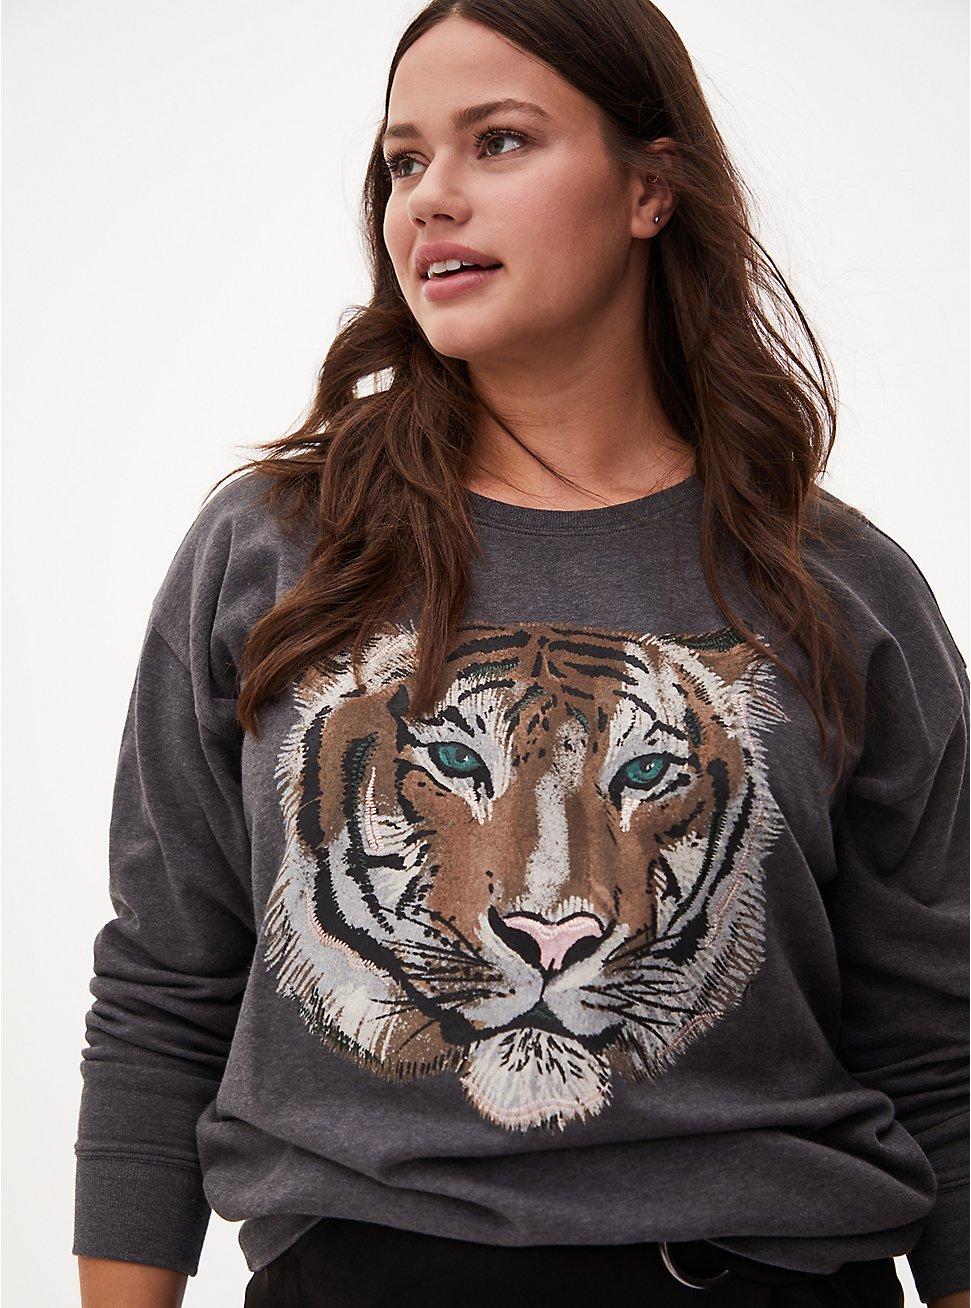 Tiger Charcoal Grey Fleece Sweatshirt, CHARCOAL  GREY, hi-res